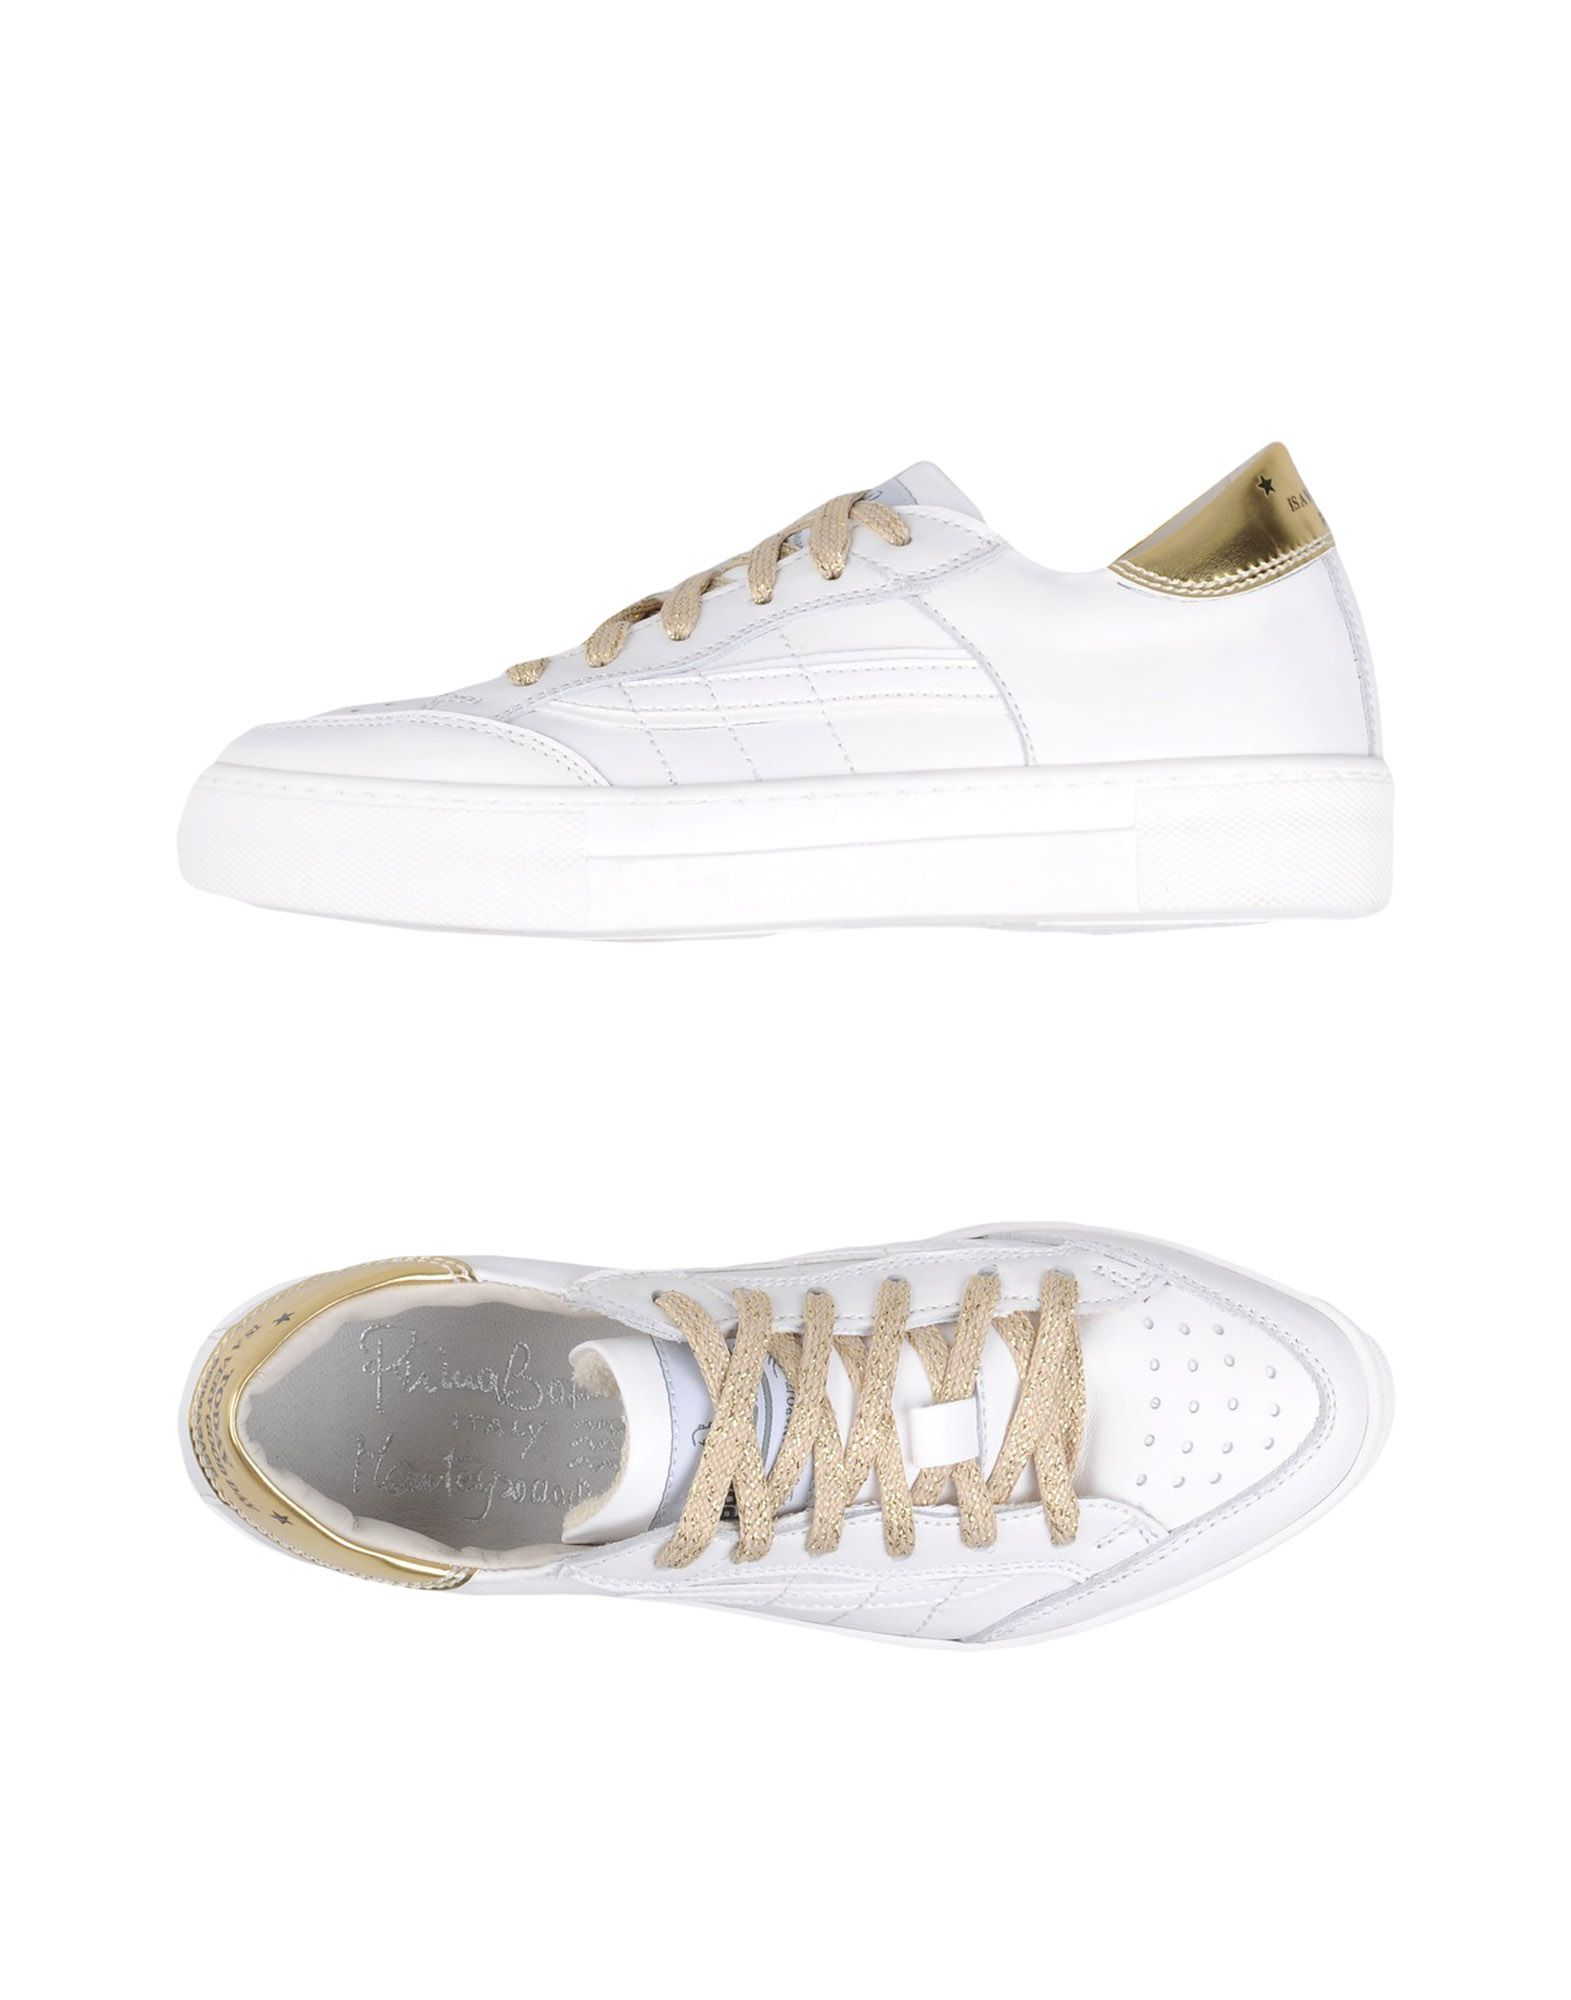 Primabase Sneakers Damen Qualität  11332857CV Gute Qualität Damen beliebte Schuhe e2c5d8